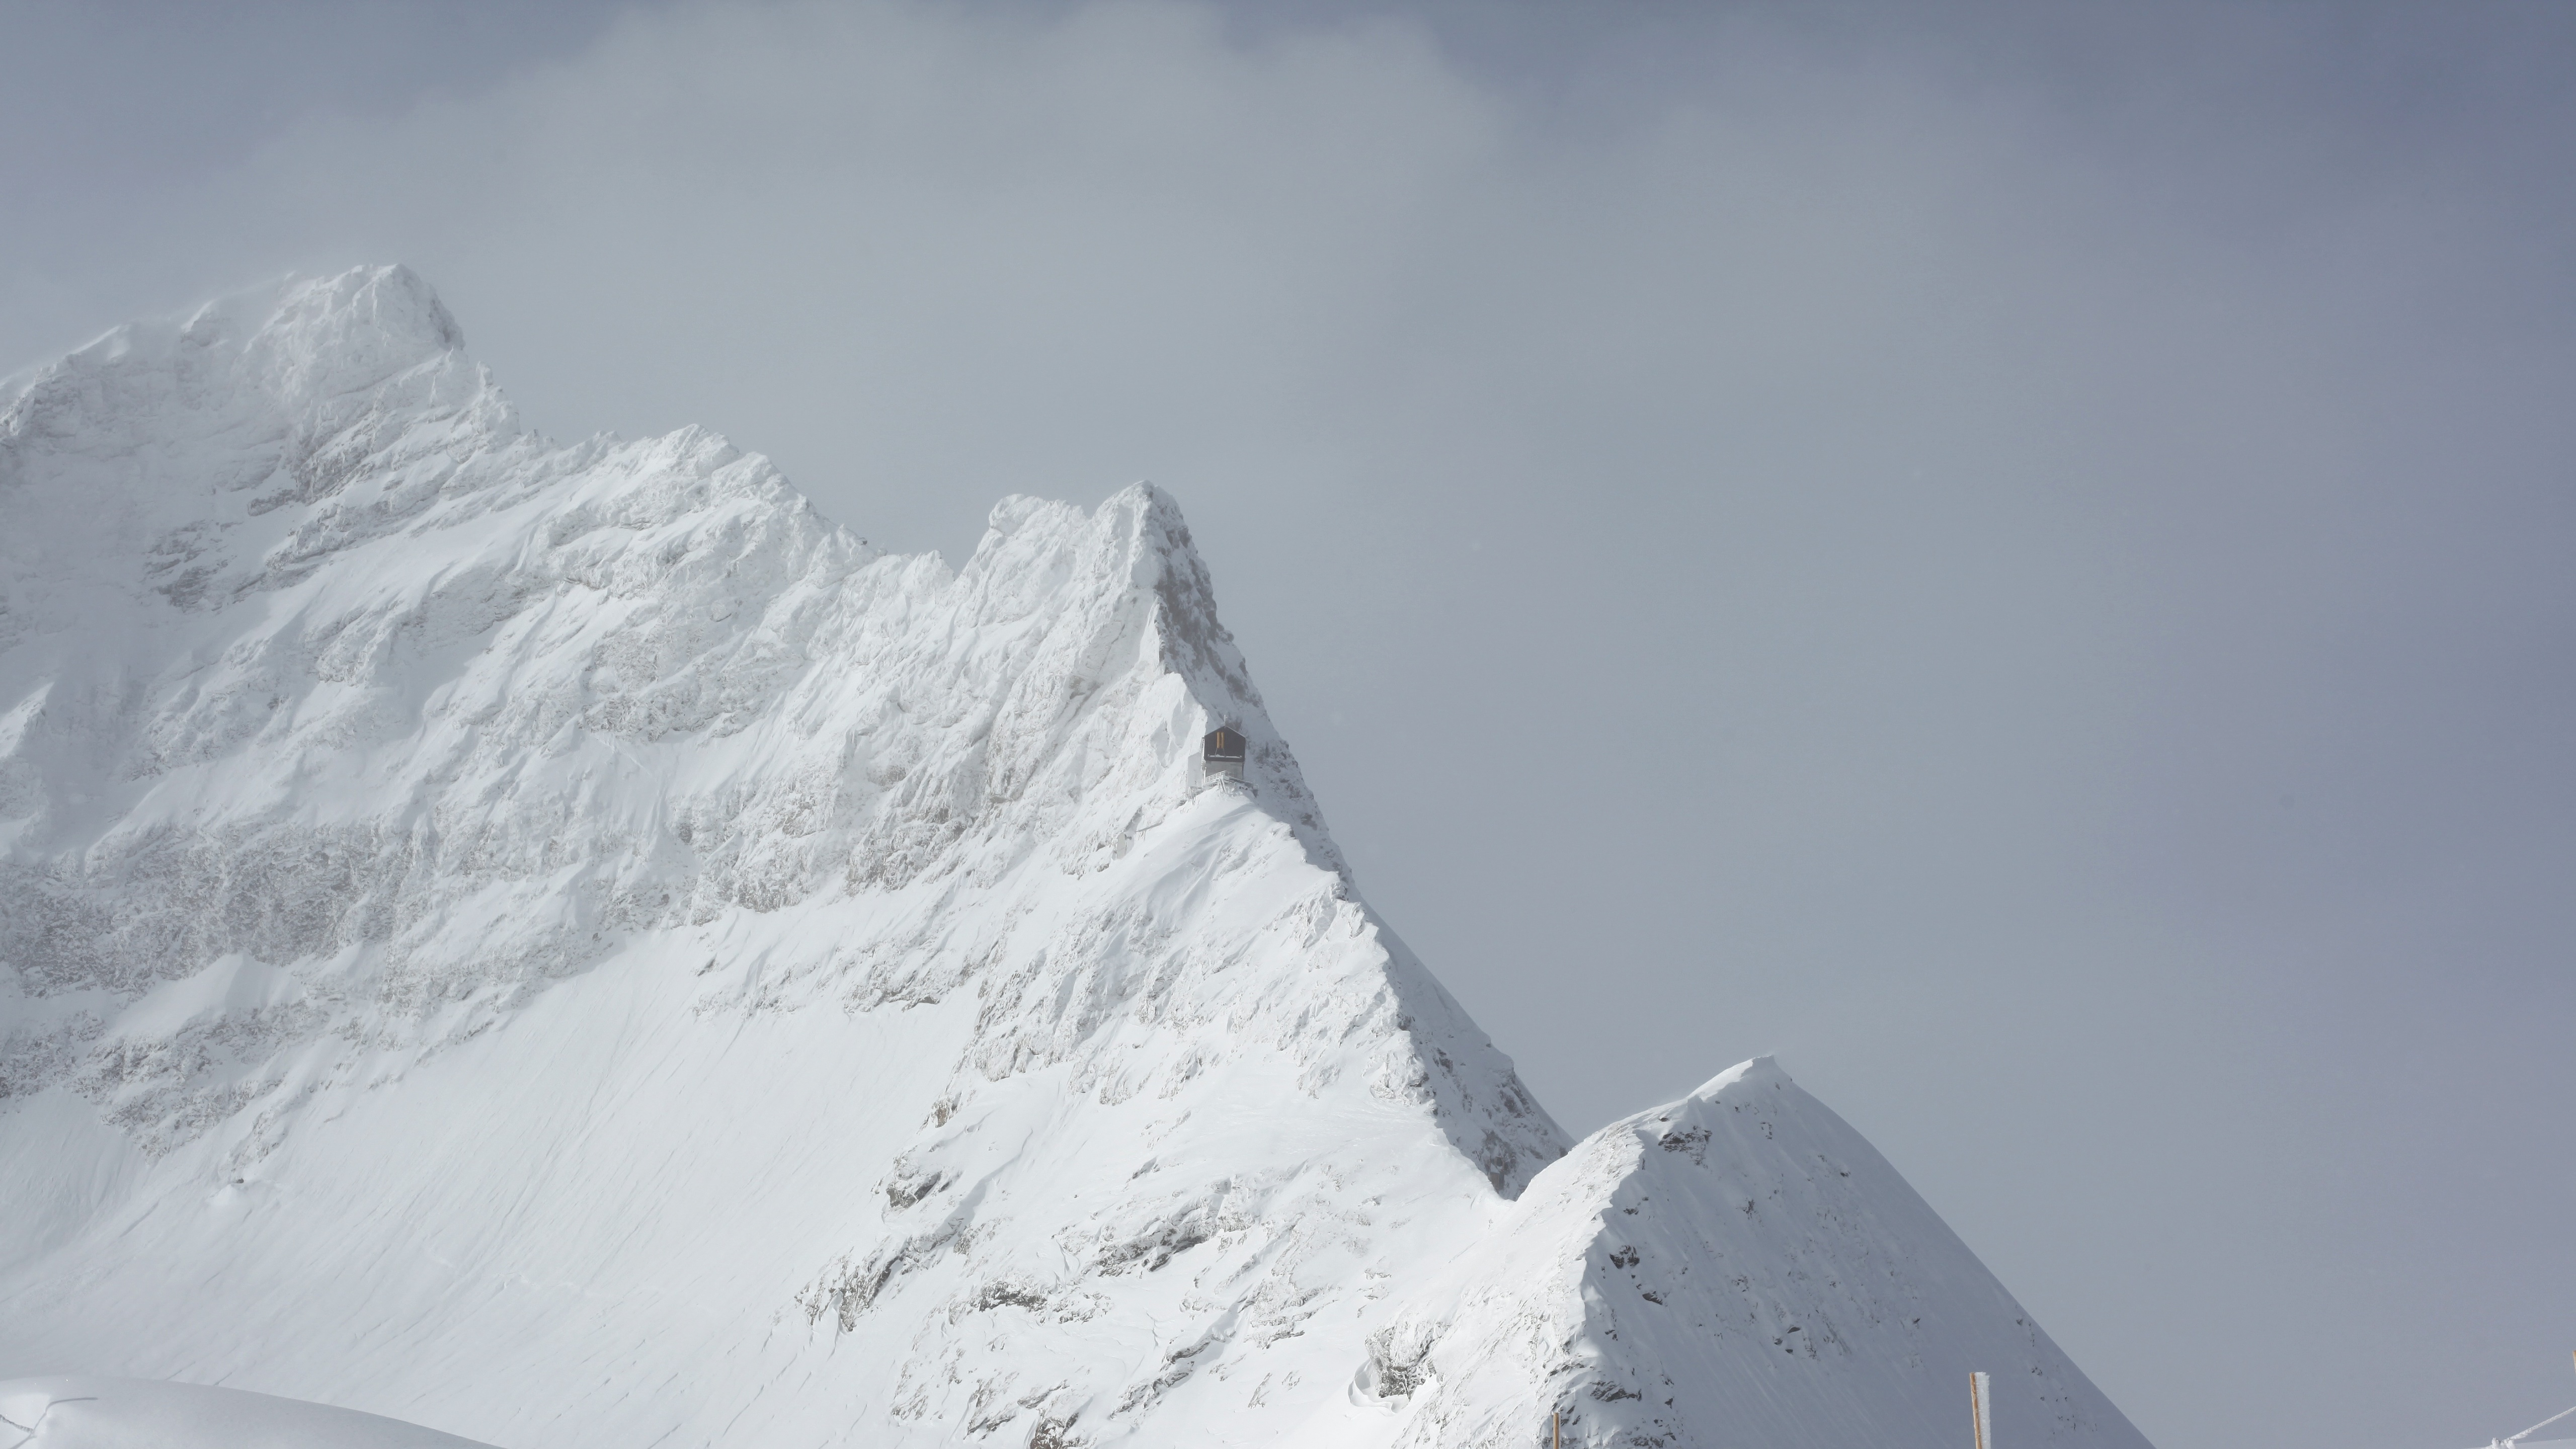 Hut on the ridge wallpaper